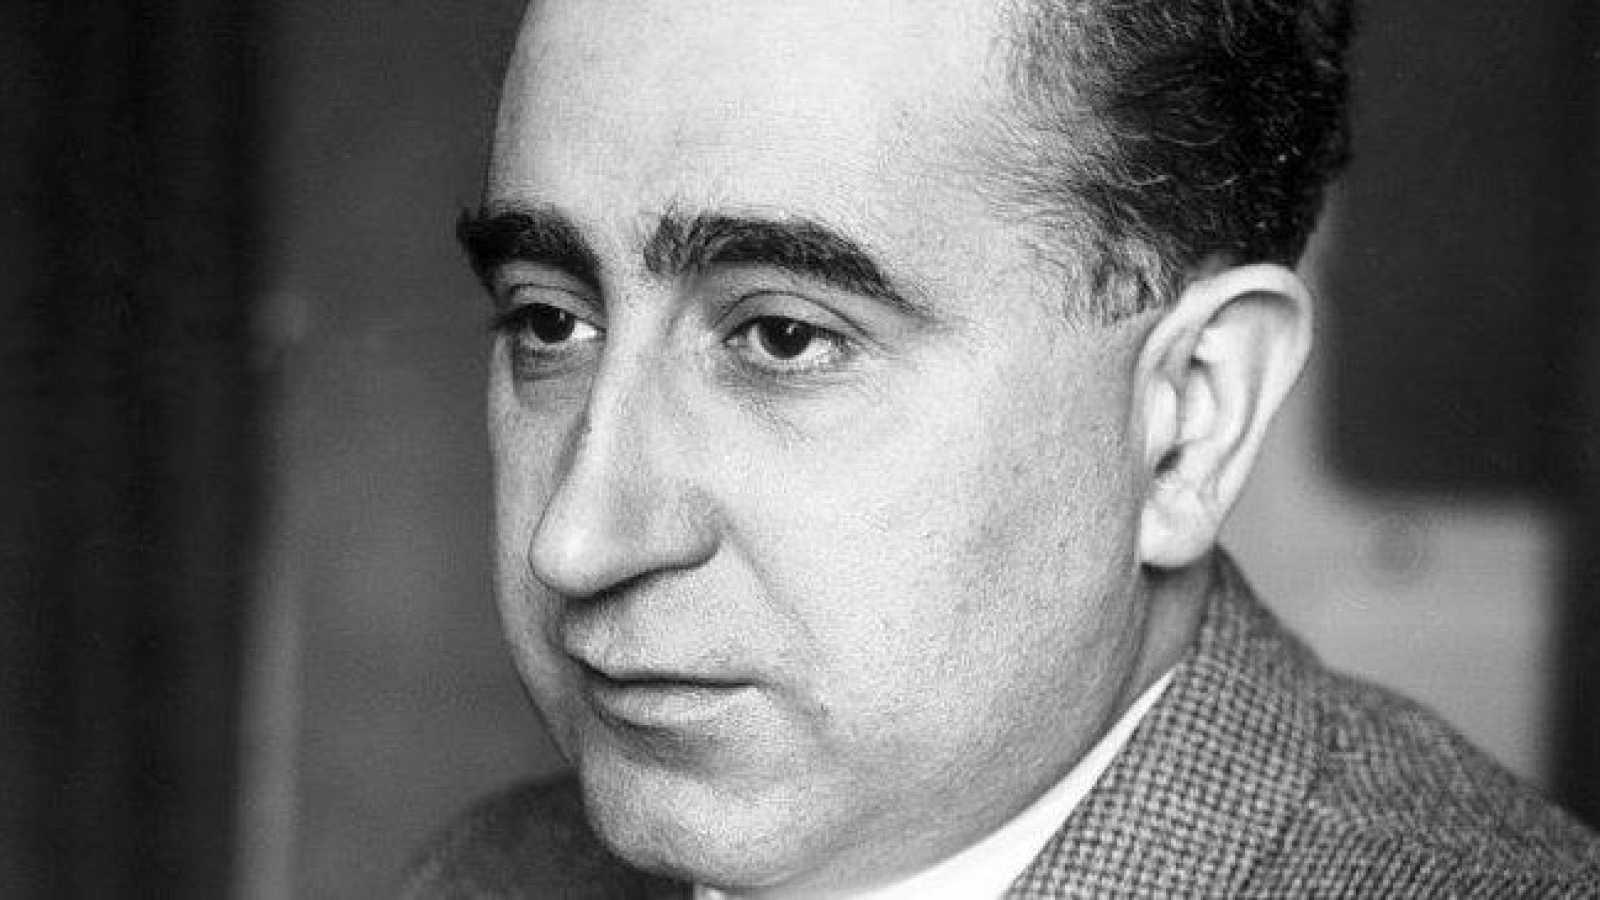 La zarzuela - Federico Moreno Torroba: 130 años - 03/03/21 - escuchar ahora